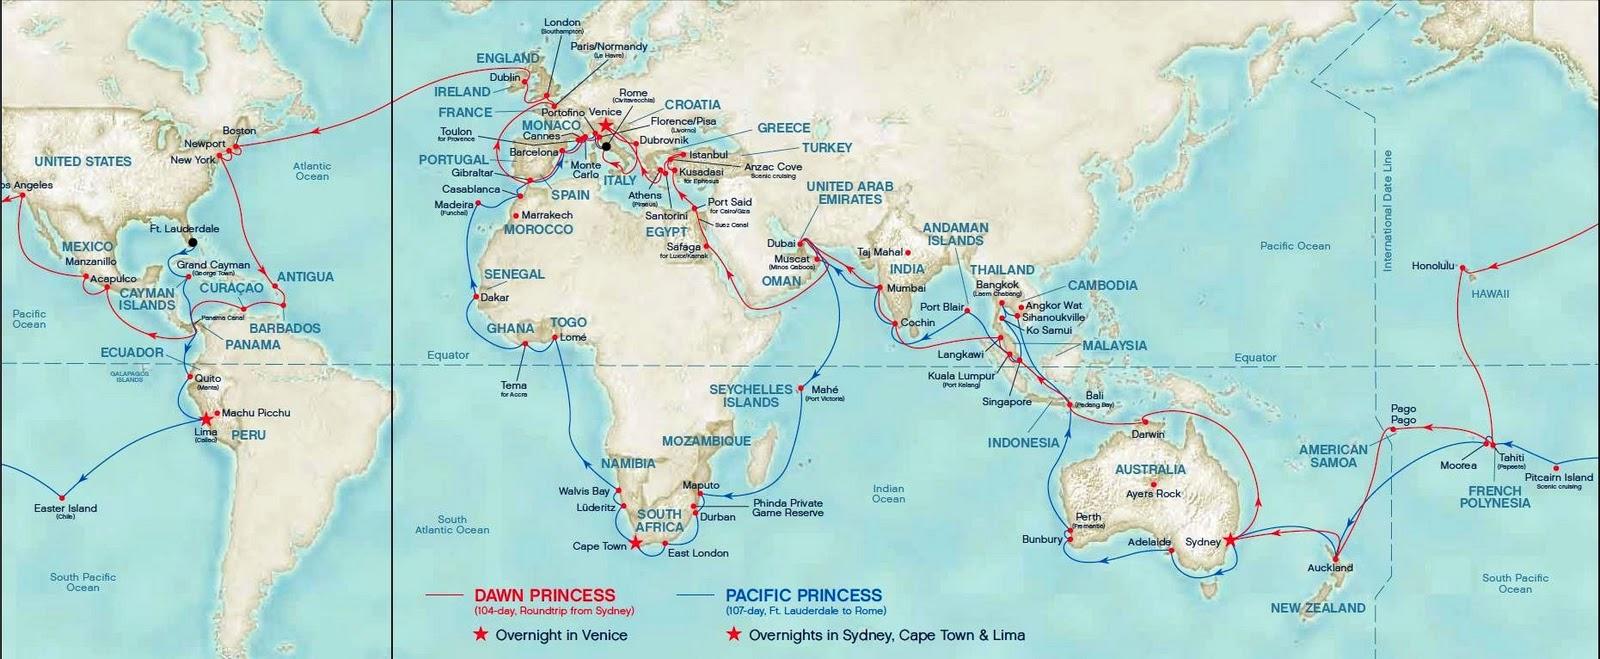 dream honeymoon world cruise one-hundred days lol